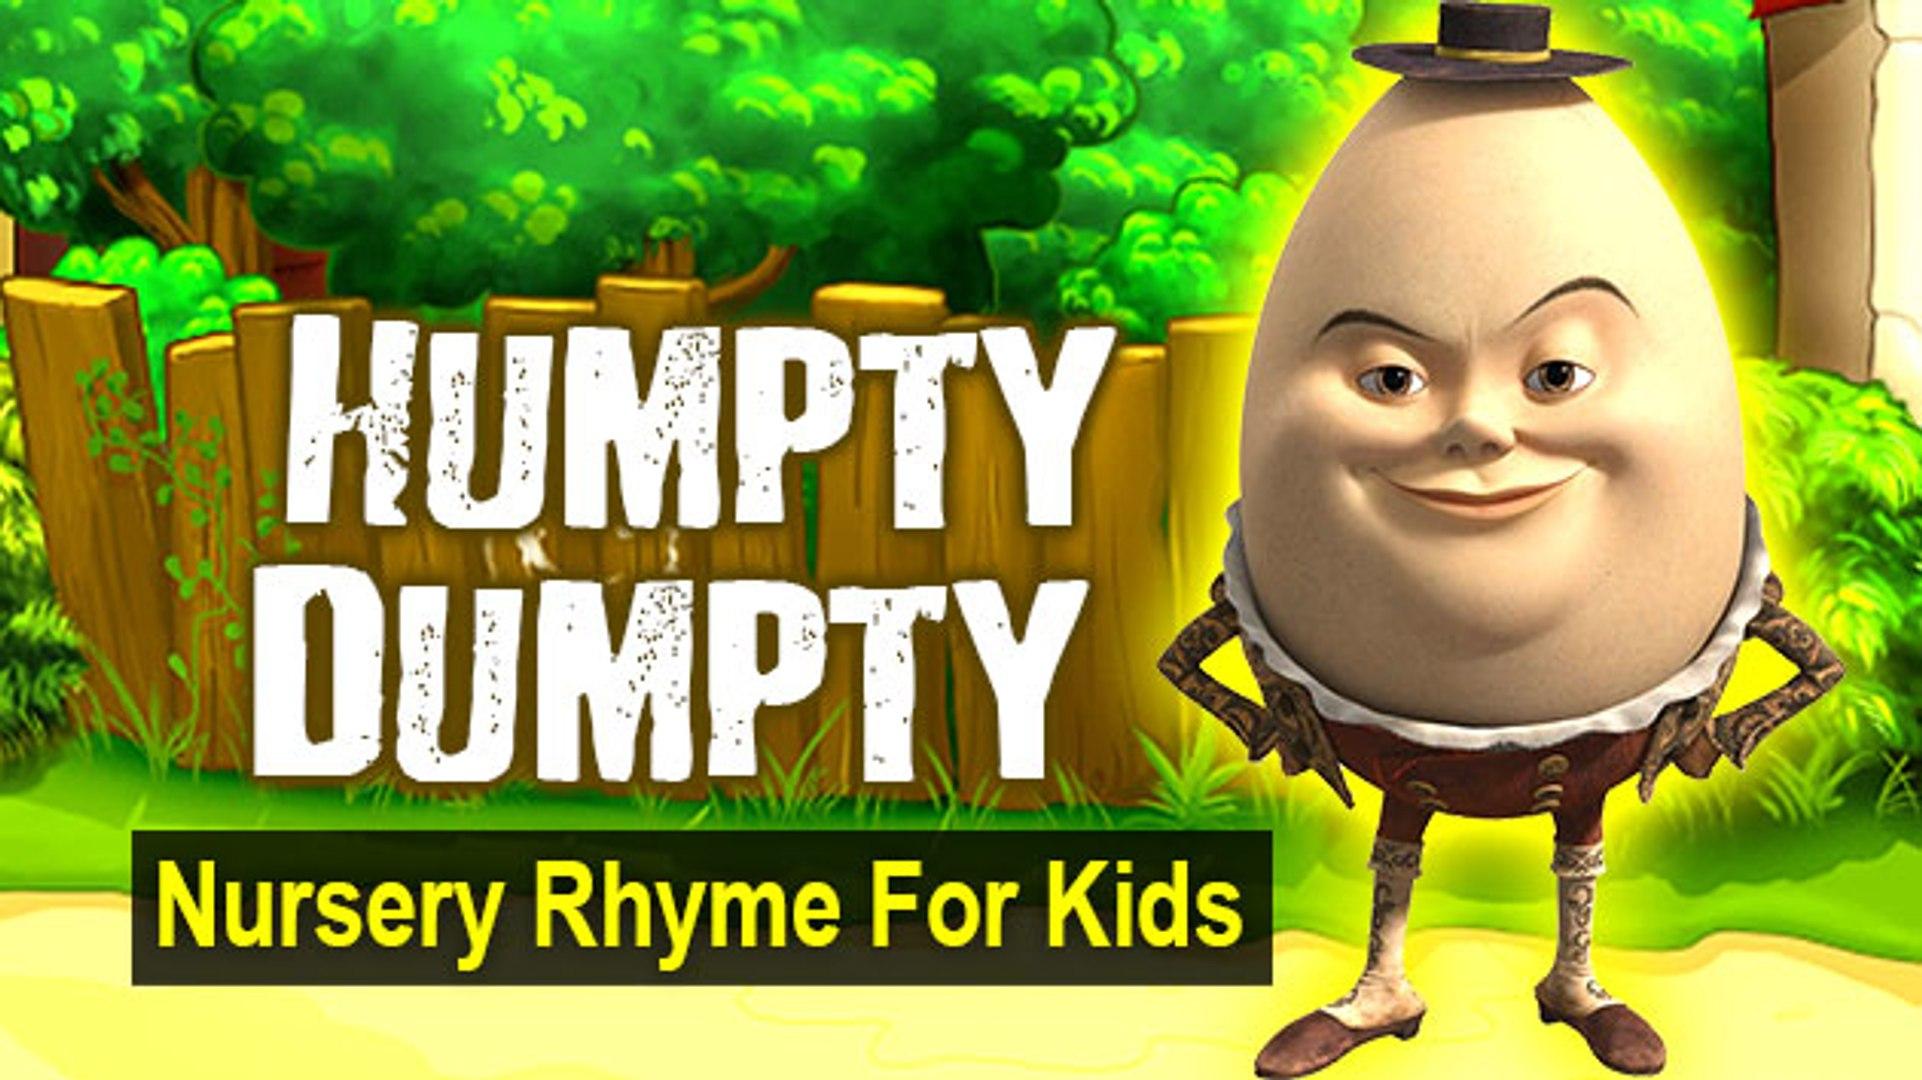 'Humpty Dumpty' - Nursery Rhyme For Kids | With Lyrics & Karaoke